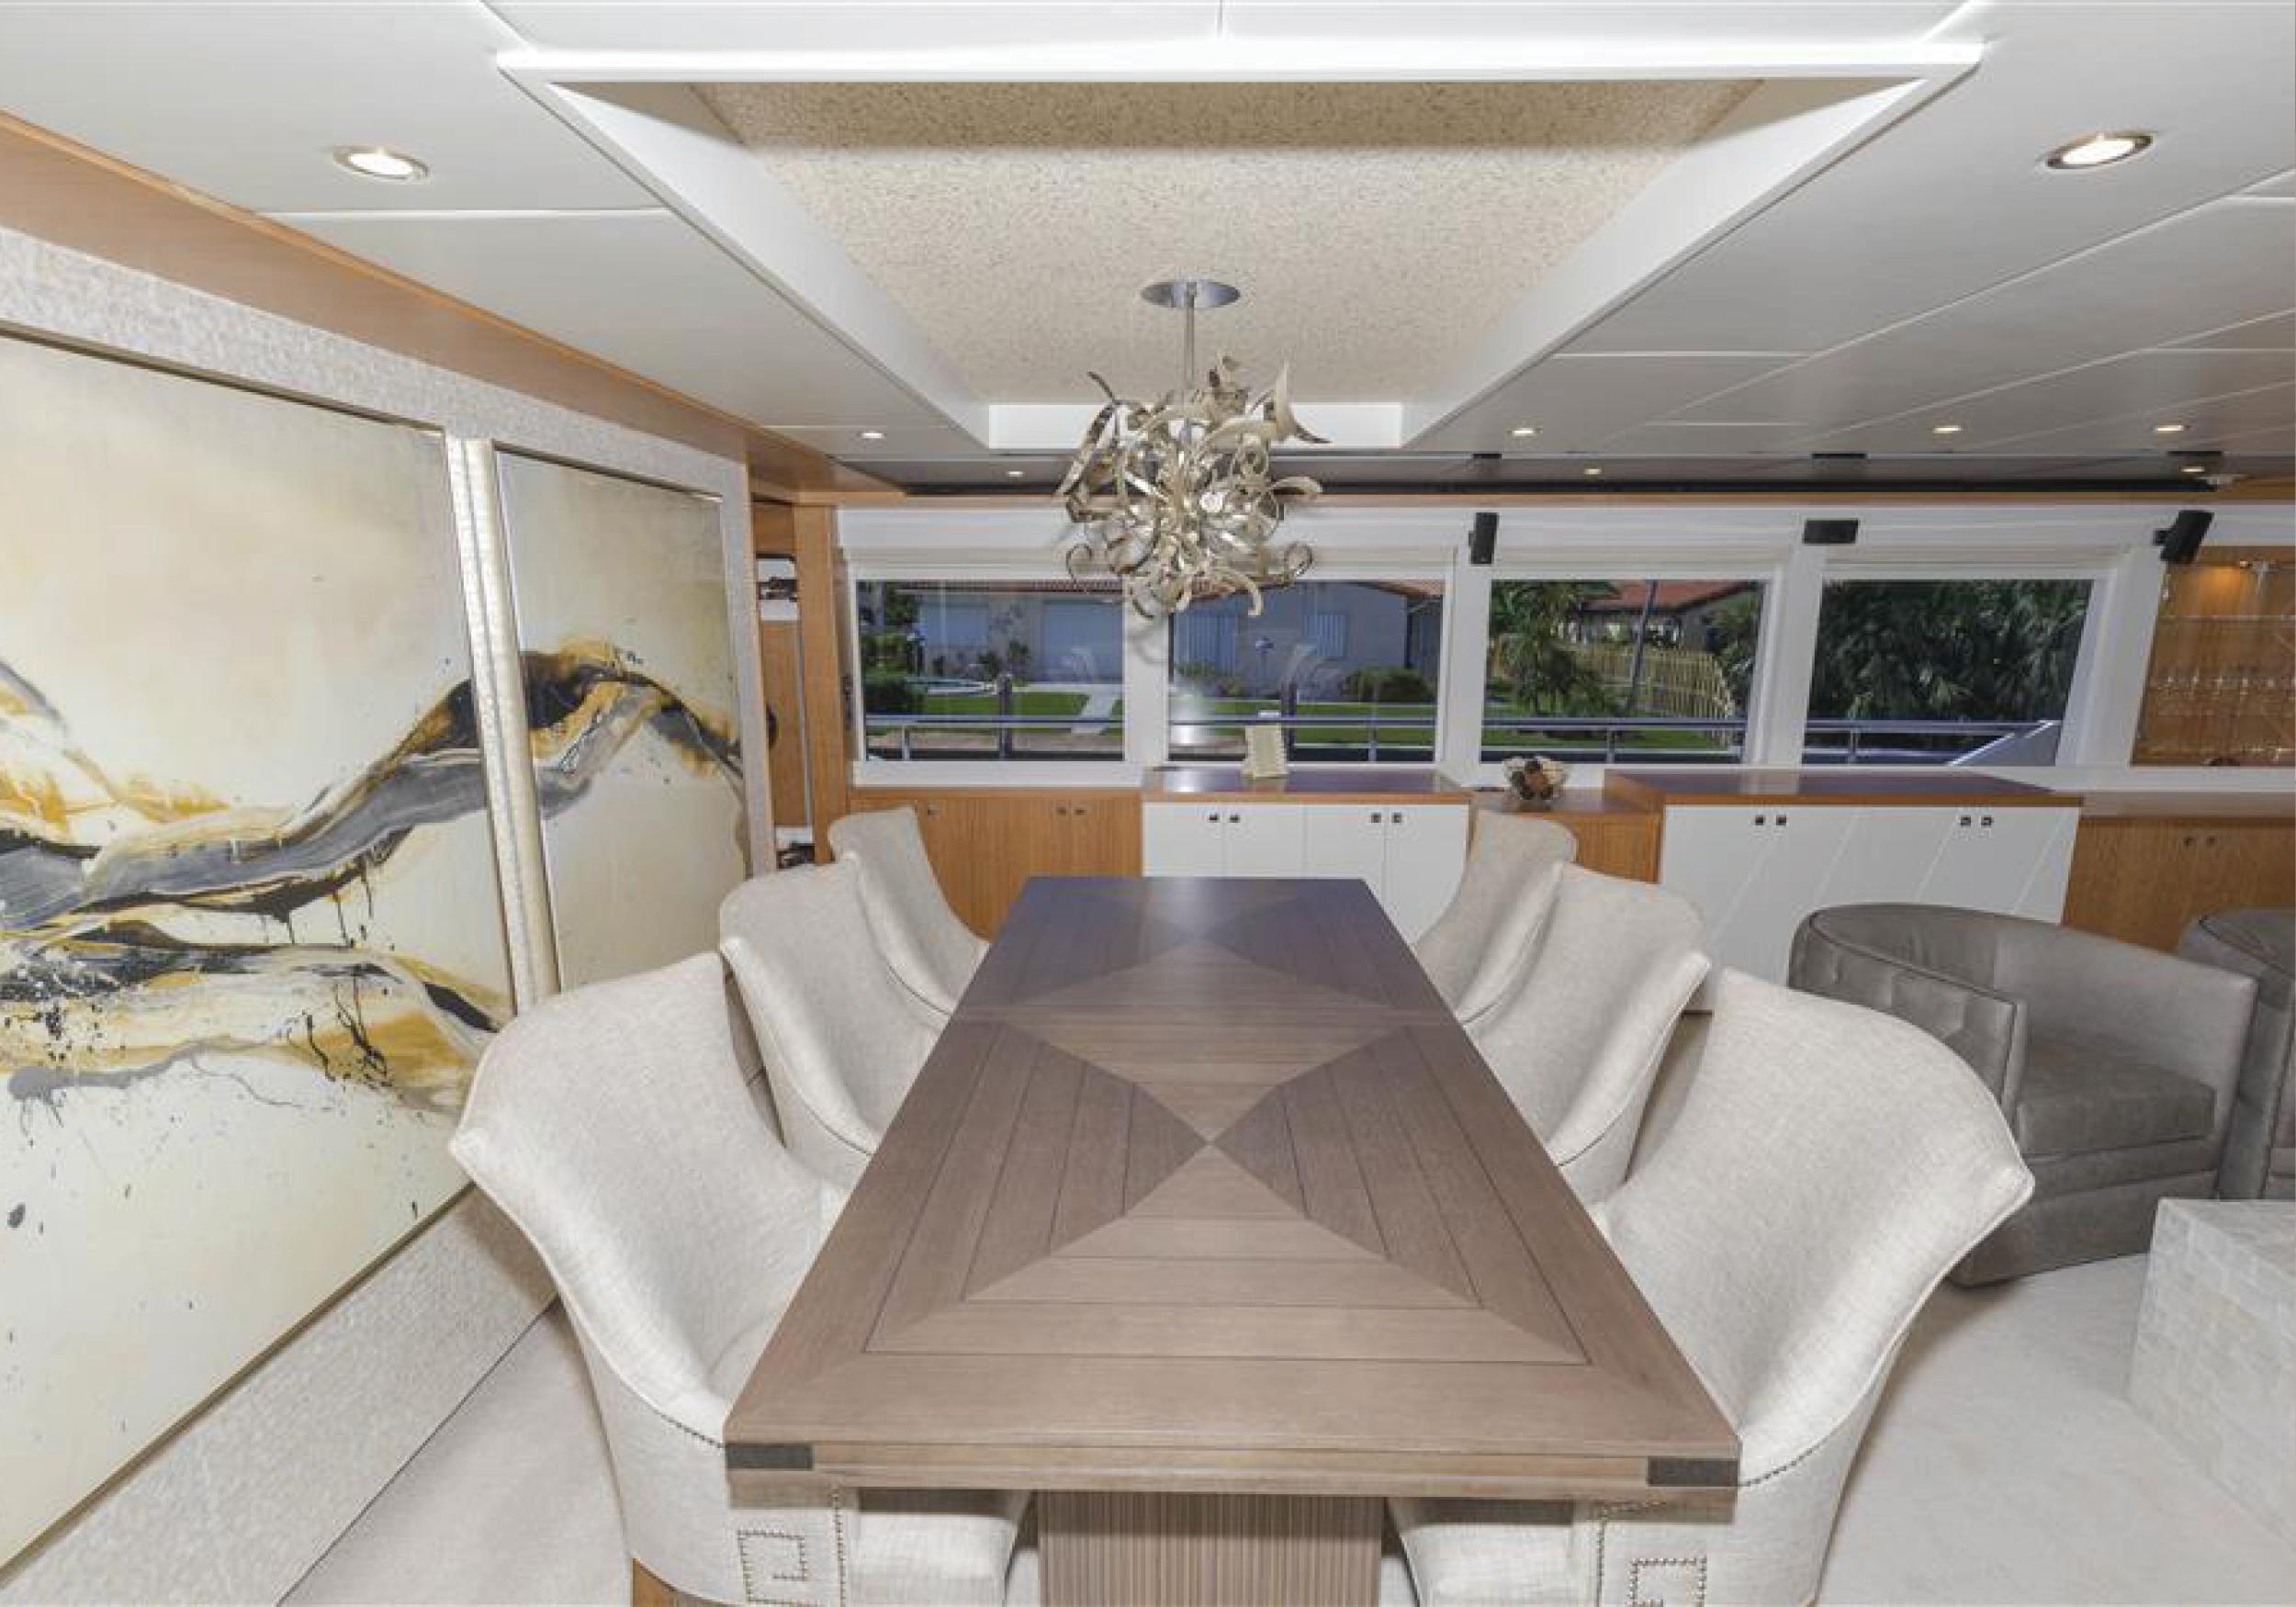 Karen-Lynn-Interior-Design-Yacht-Johnson93-4.jpg